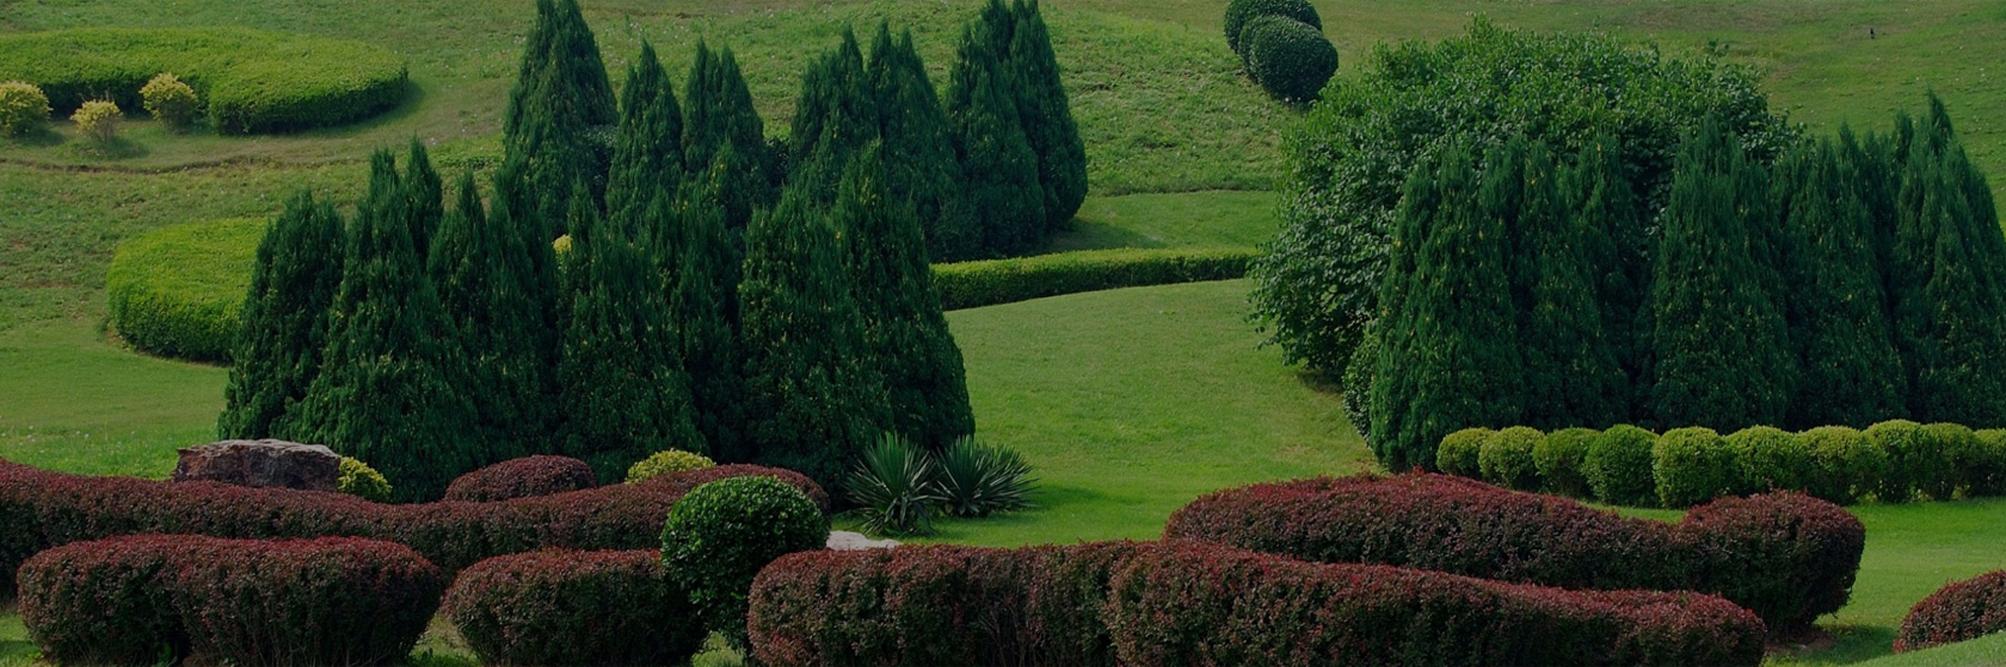 entretien jardin cambrai travaux forestiers saint quentin